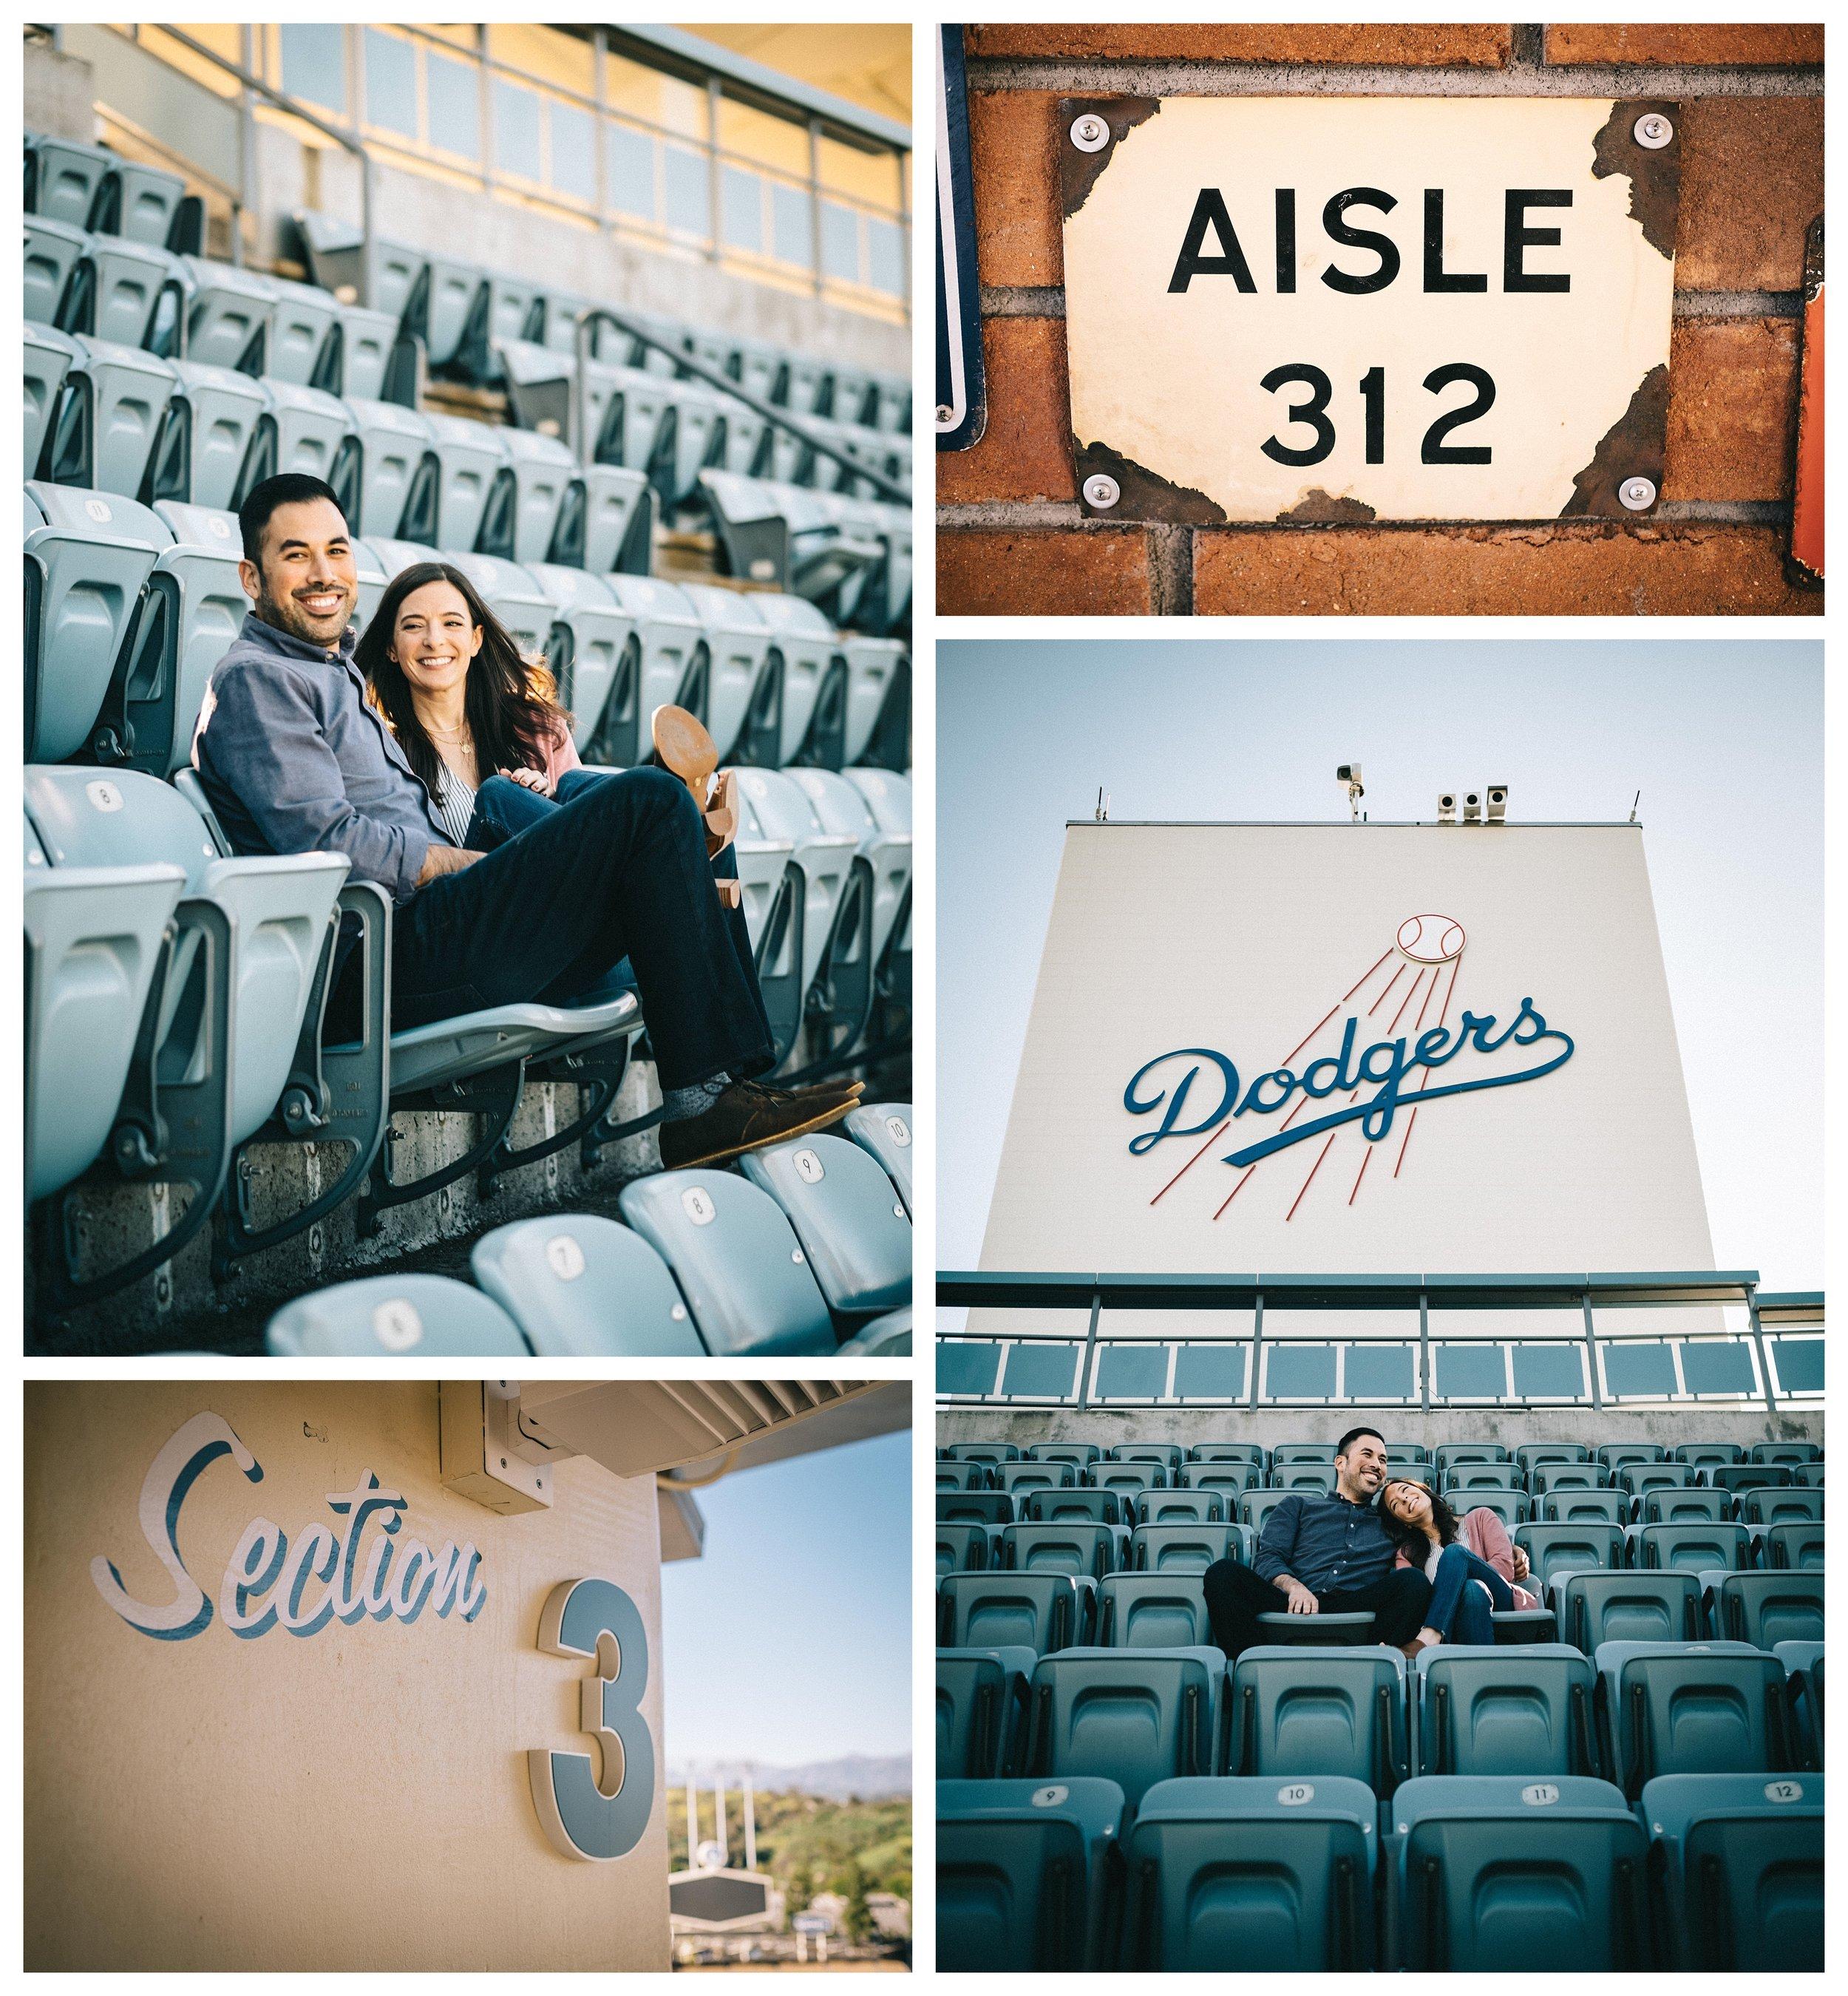 Dodger_Stadium_Engagement_Session_Nick_Mueller_Photography_4.jpg